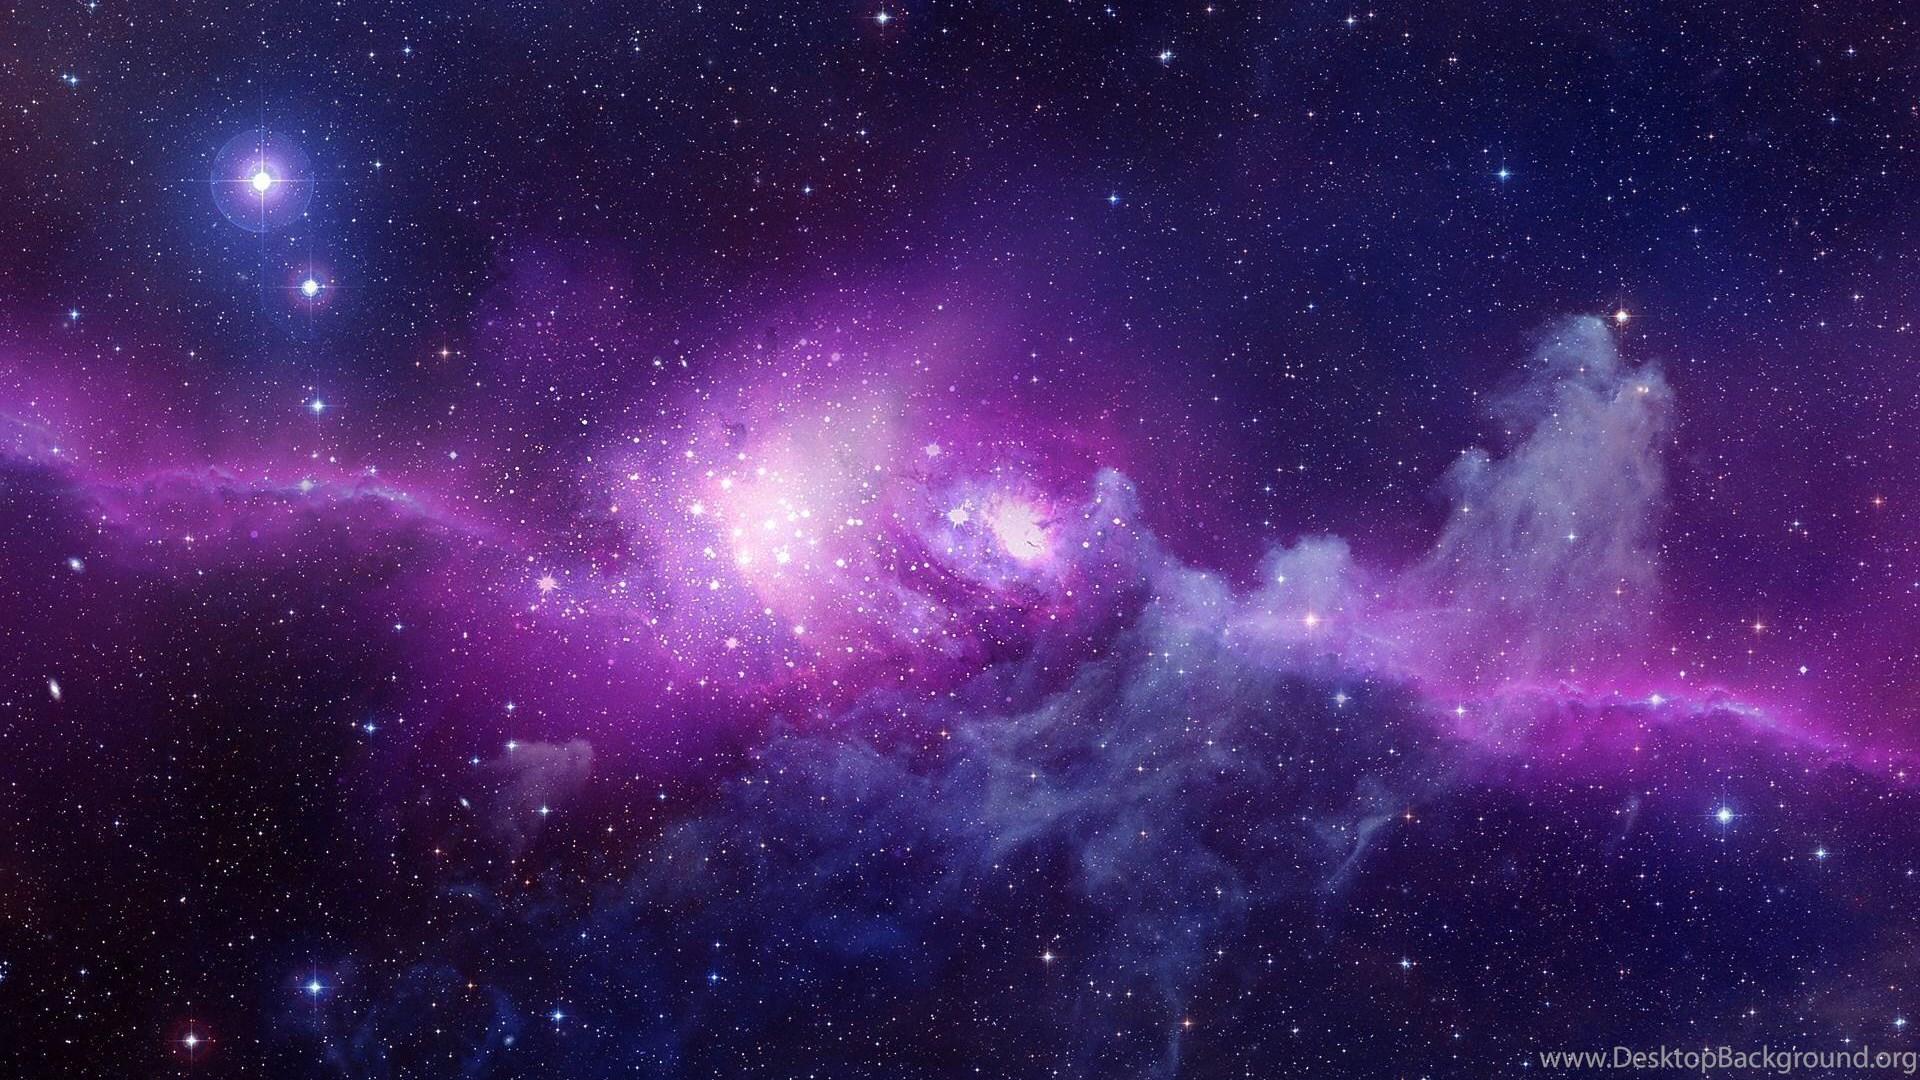 Galaxy Wallpapers Tumblr Desktop Background